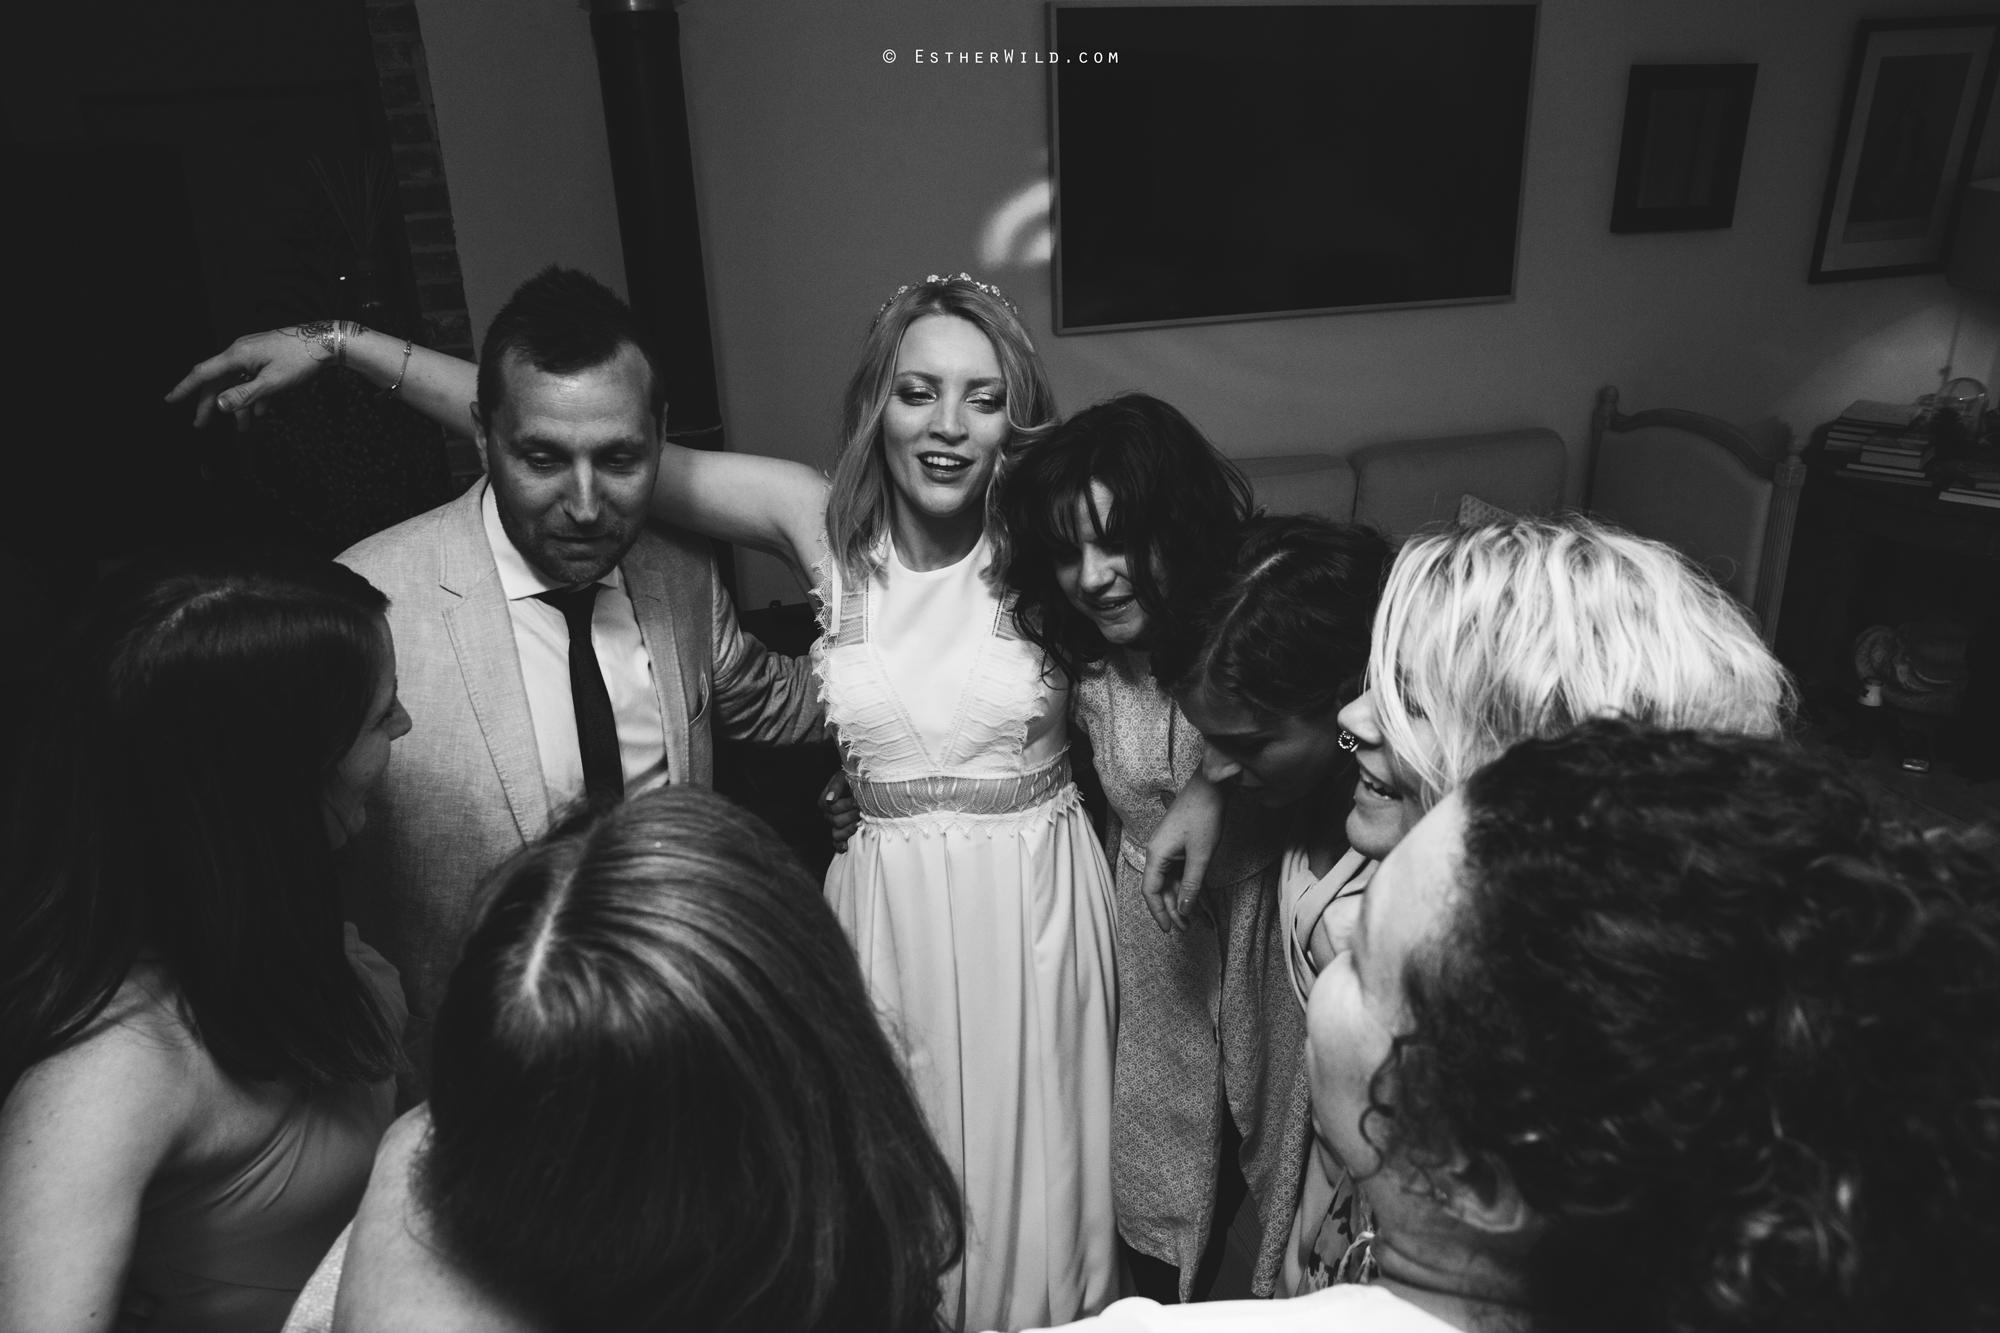 IMG_3134-1Cley_Barn_Drift_Norfolk_Coast_Wedding_Copyright_Esther_Wild_Photographer_.jpg